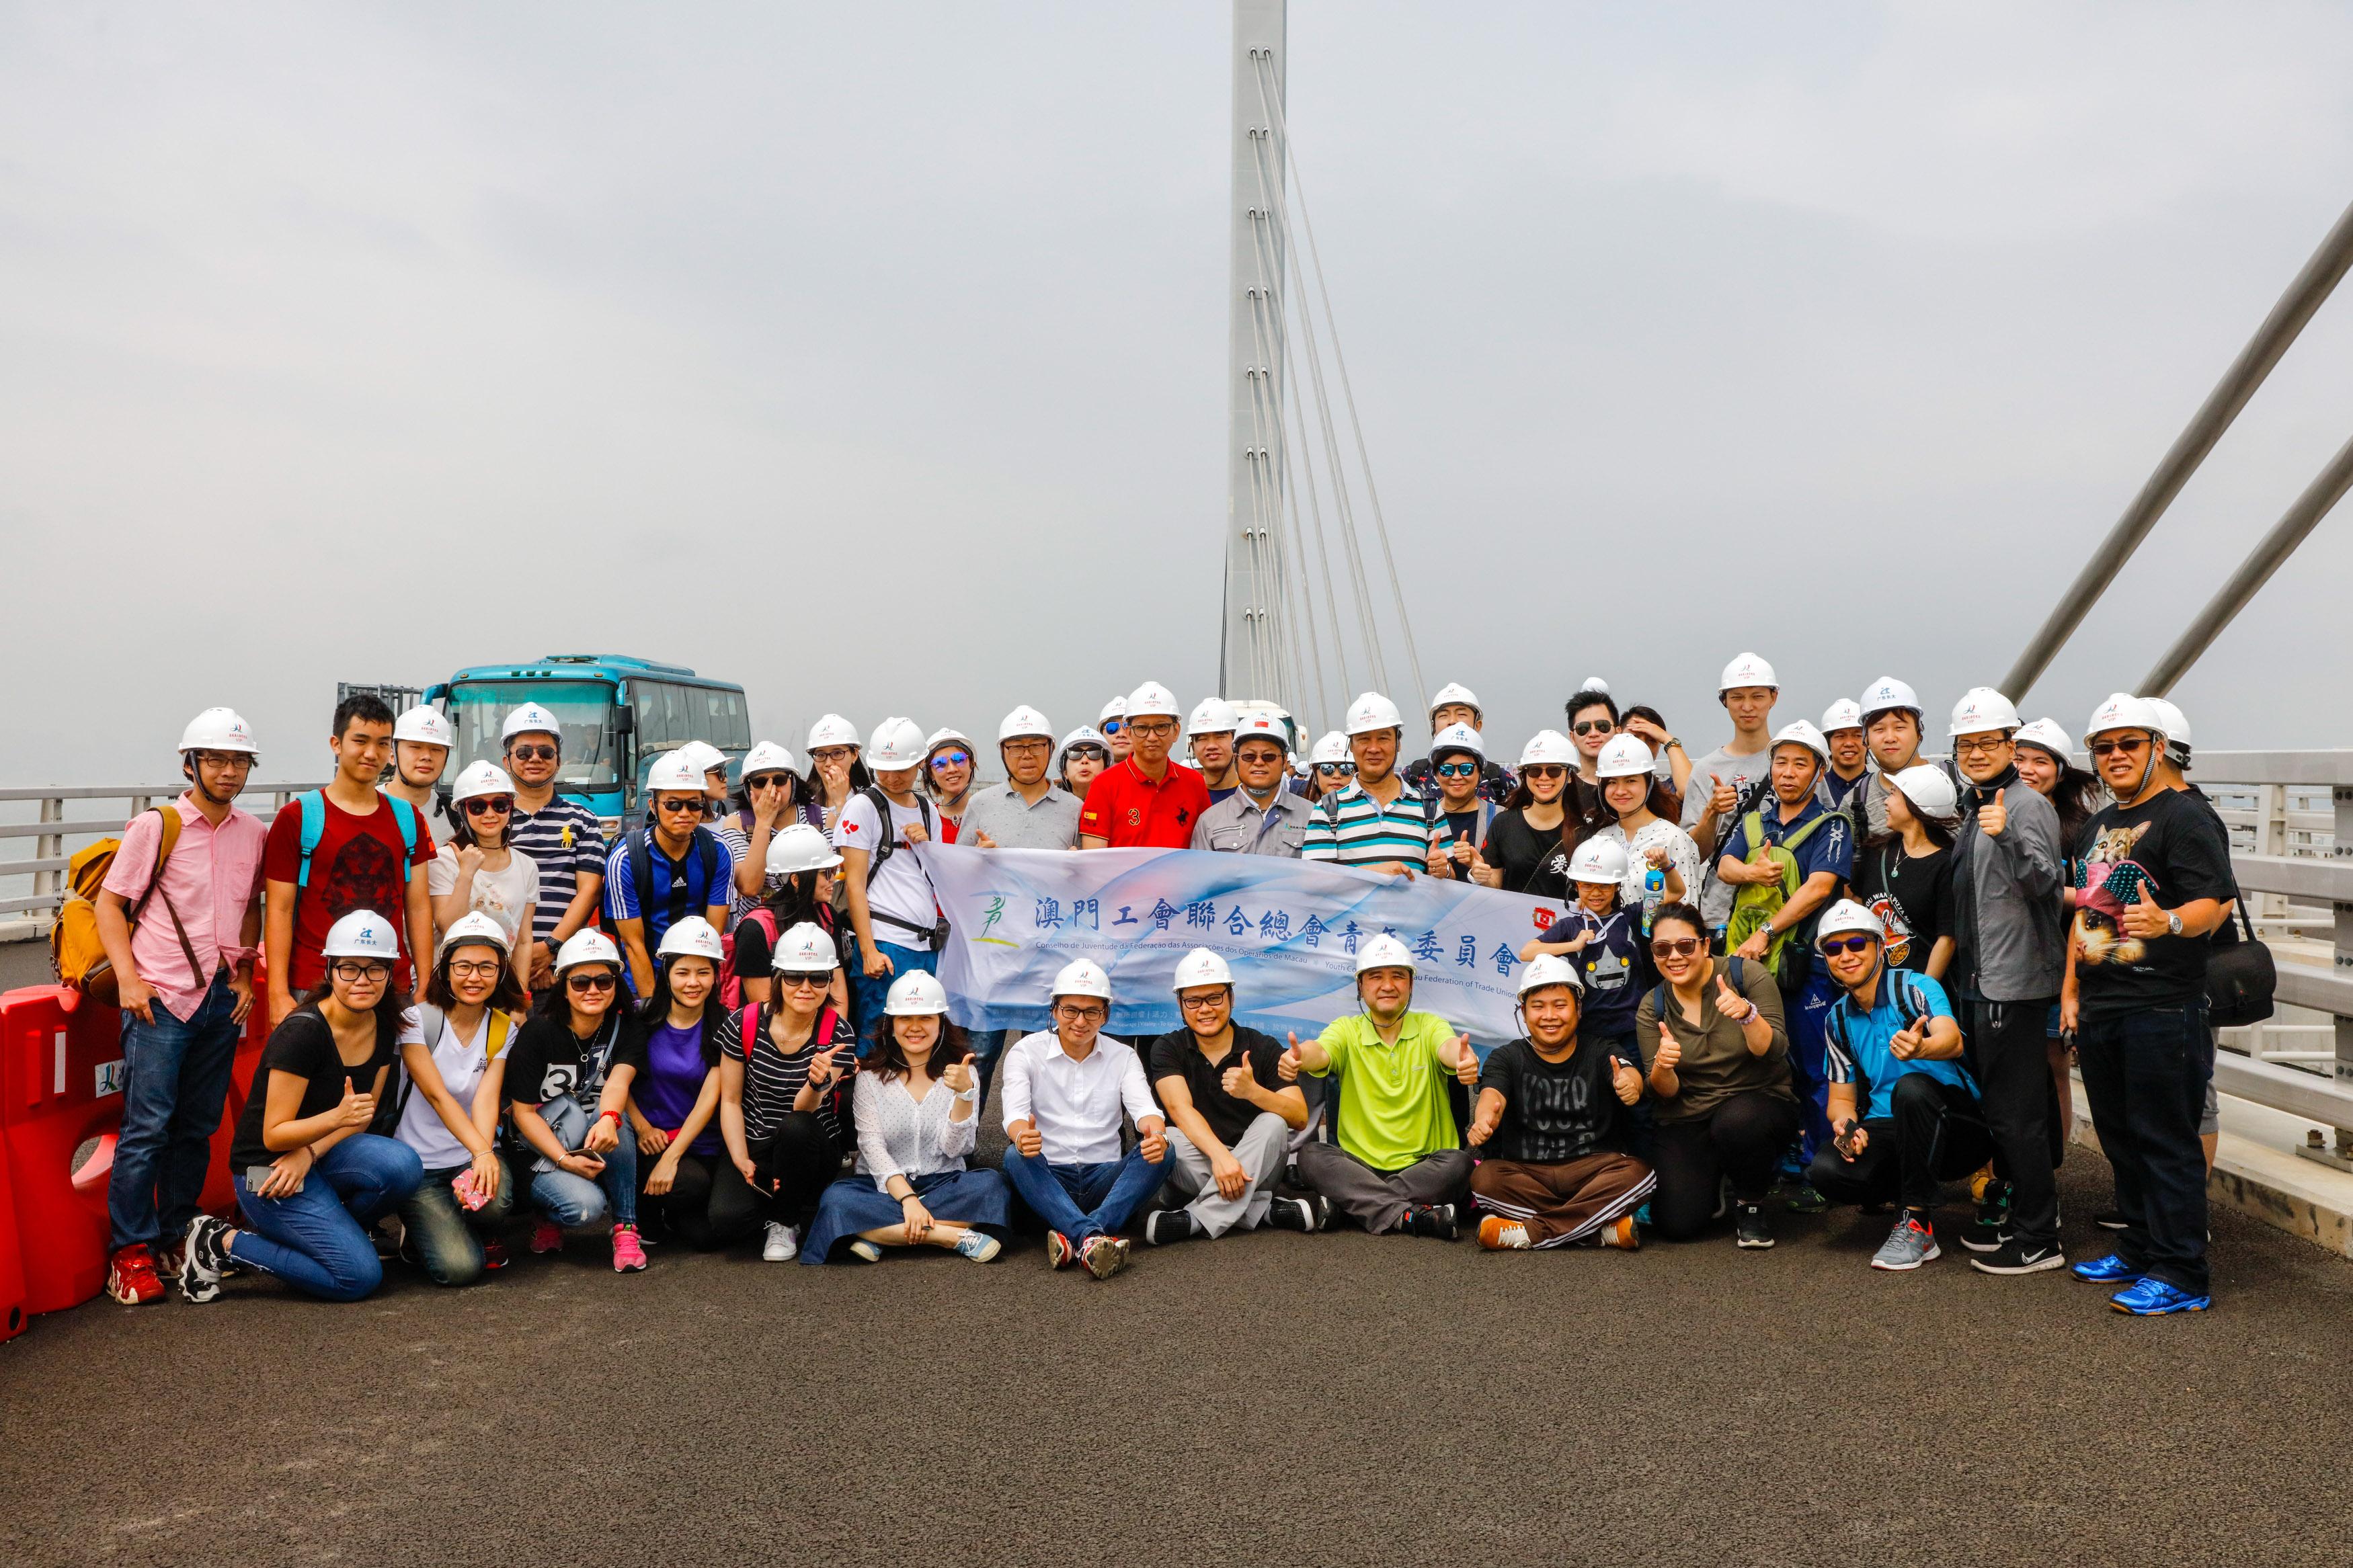 A07-2017年工聯青委考察在建中的港珠澳大橋